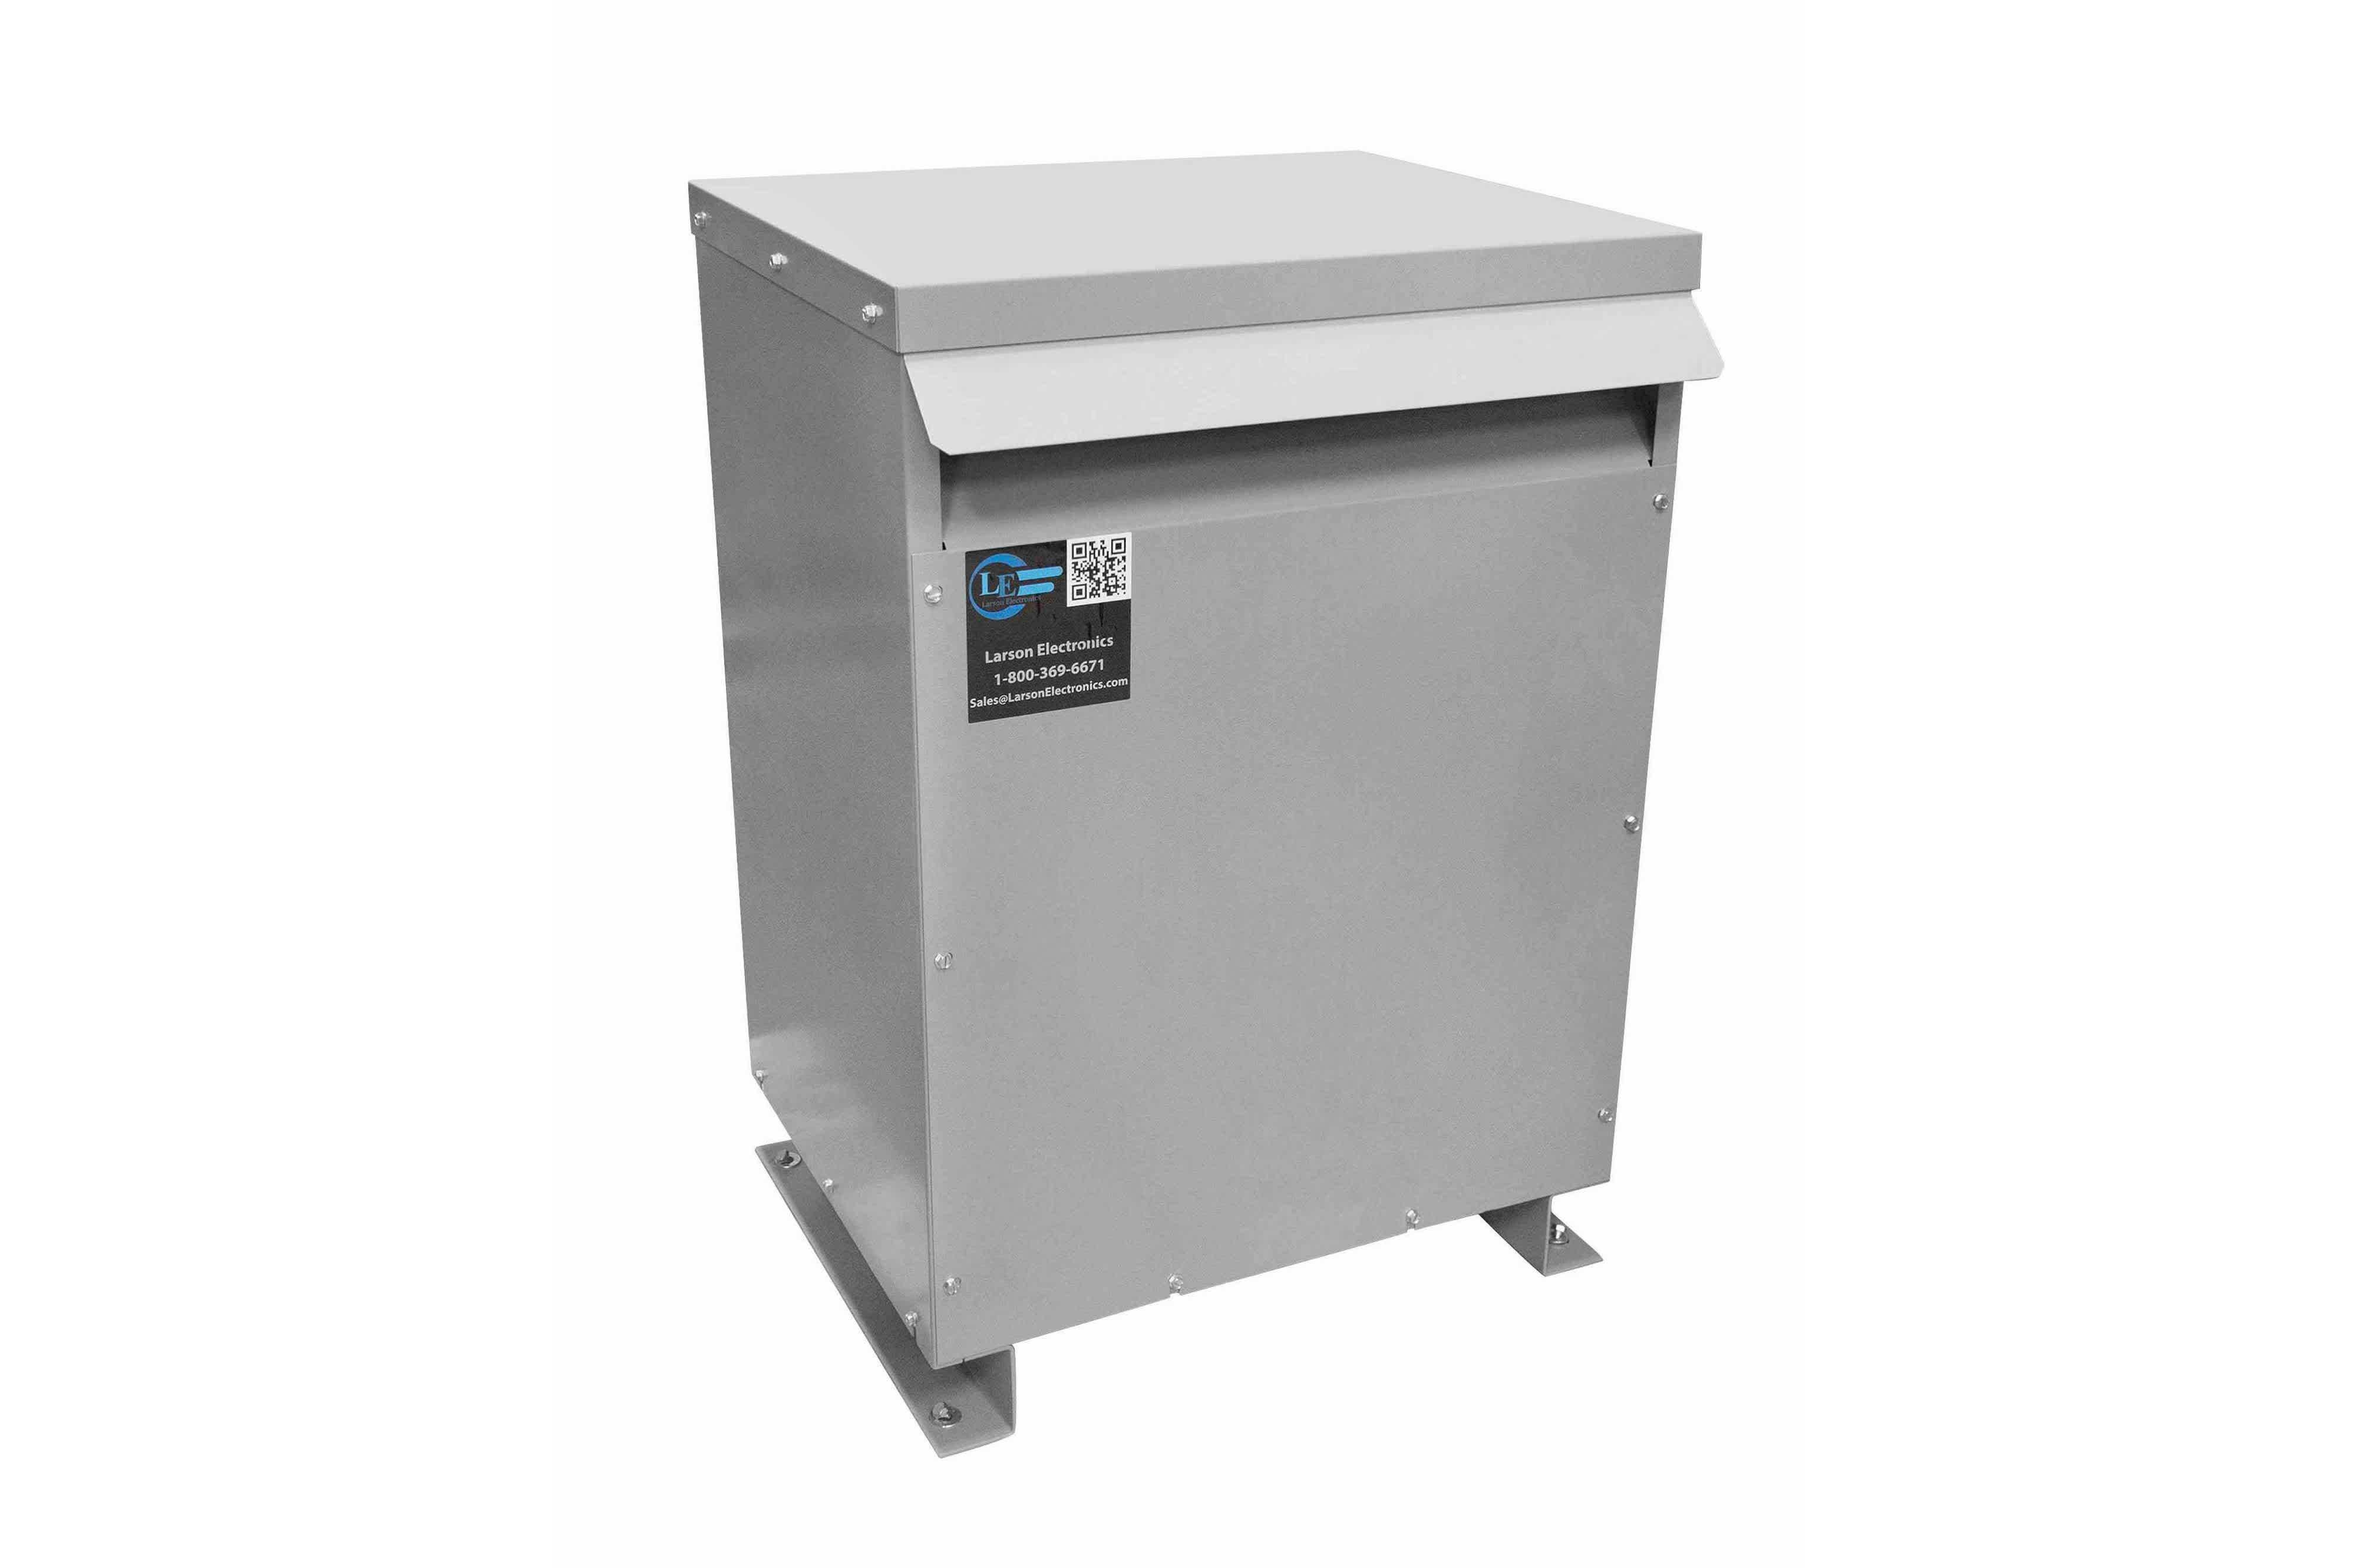 42.5 kVA 3PH Isolation Transformer, 460V Wye Primary, 240V Delta Secondary, N3R, Ventilated, 60 Hz